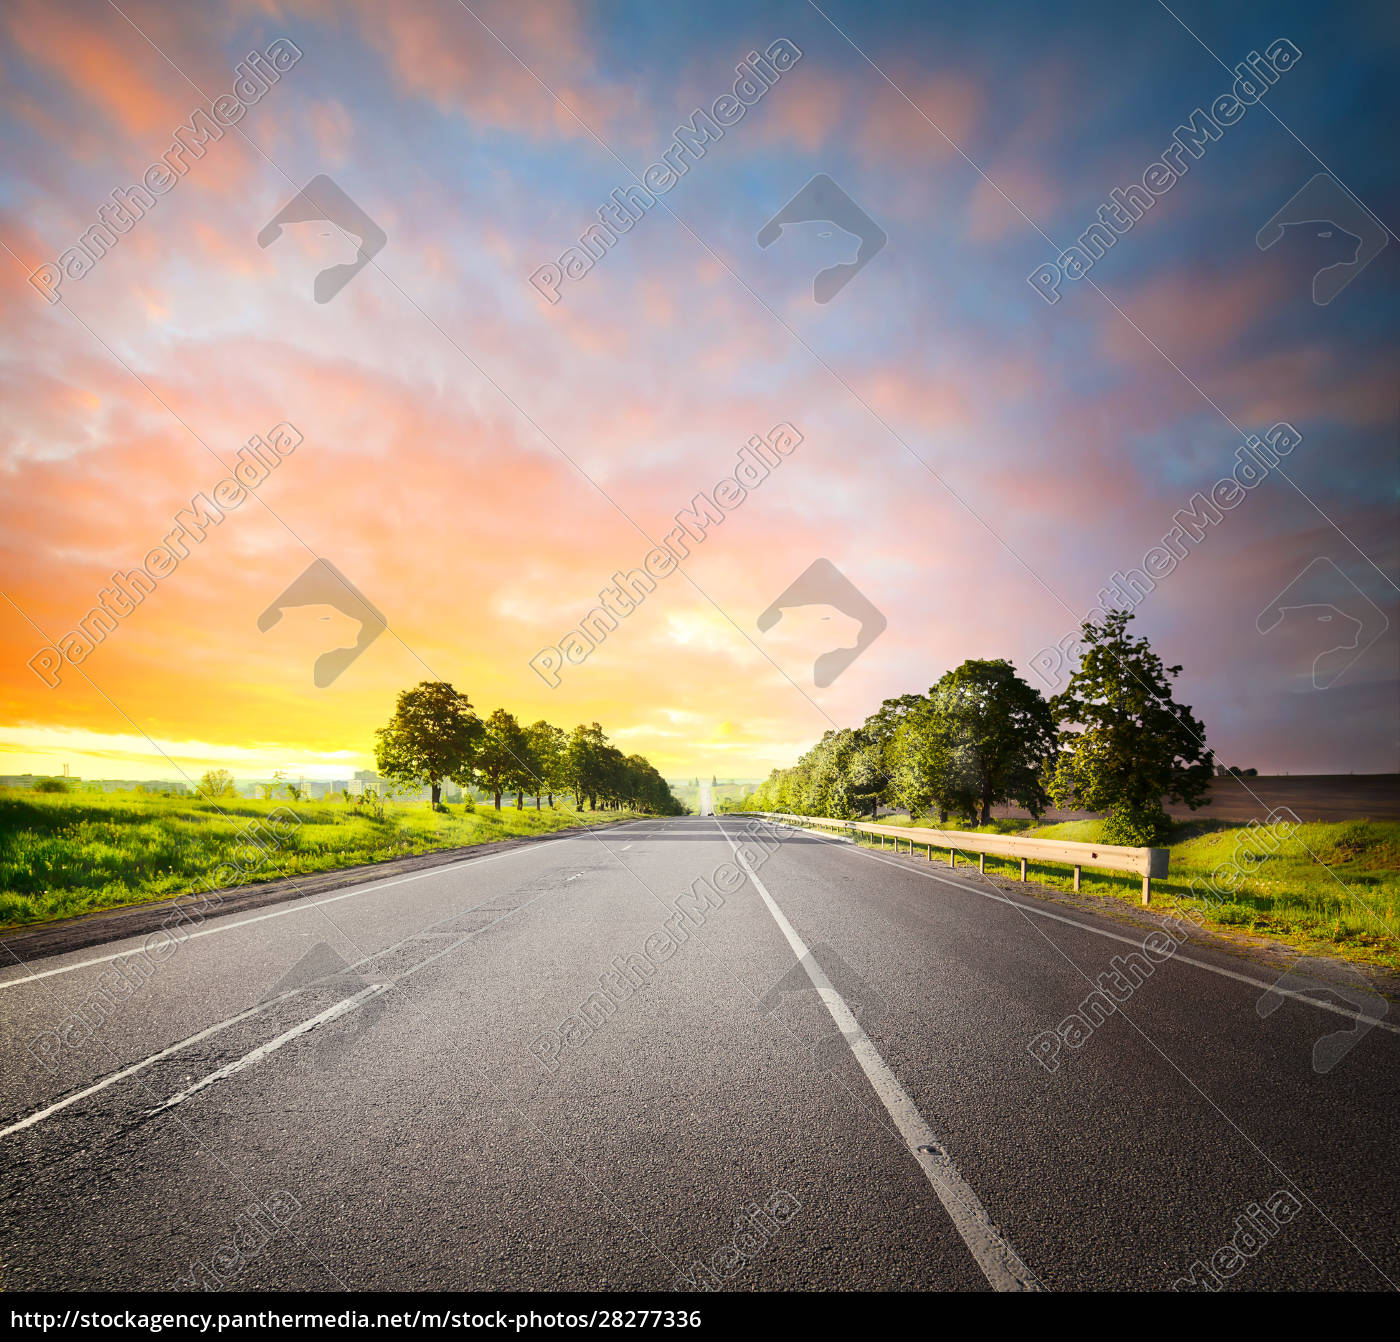 landscape, with, asphalt, road, among, fields - 28277336